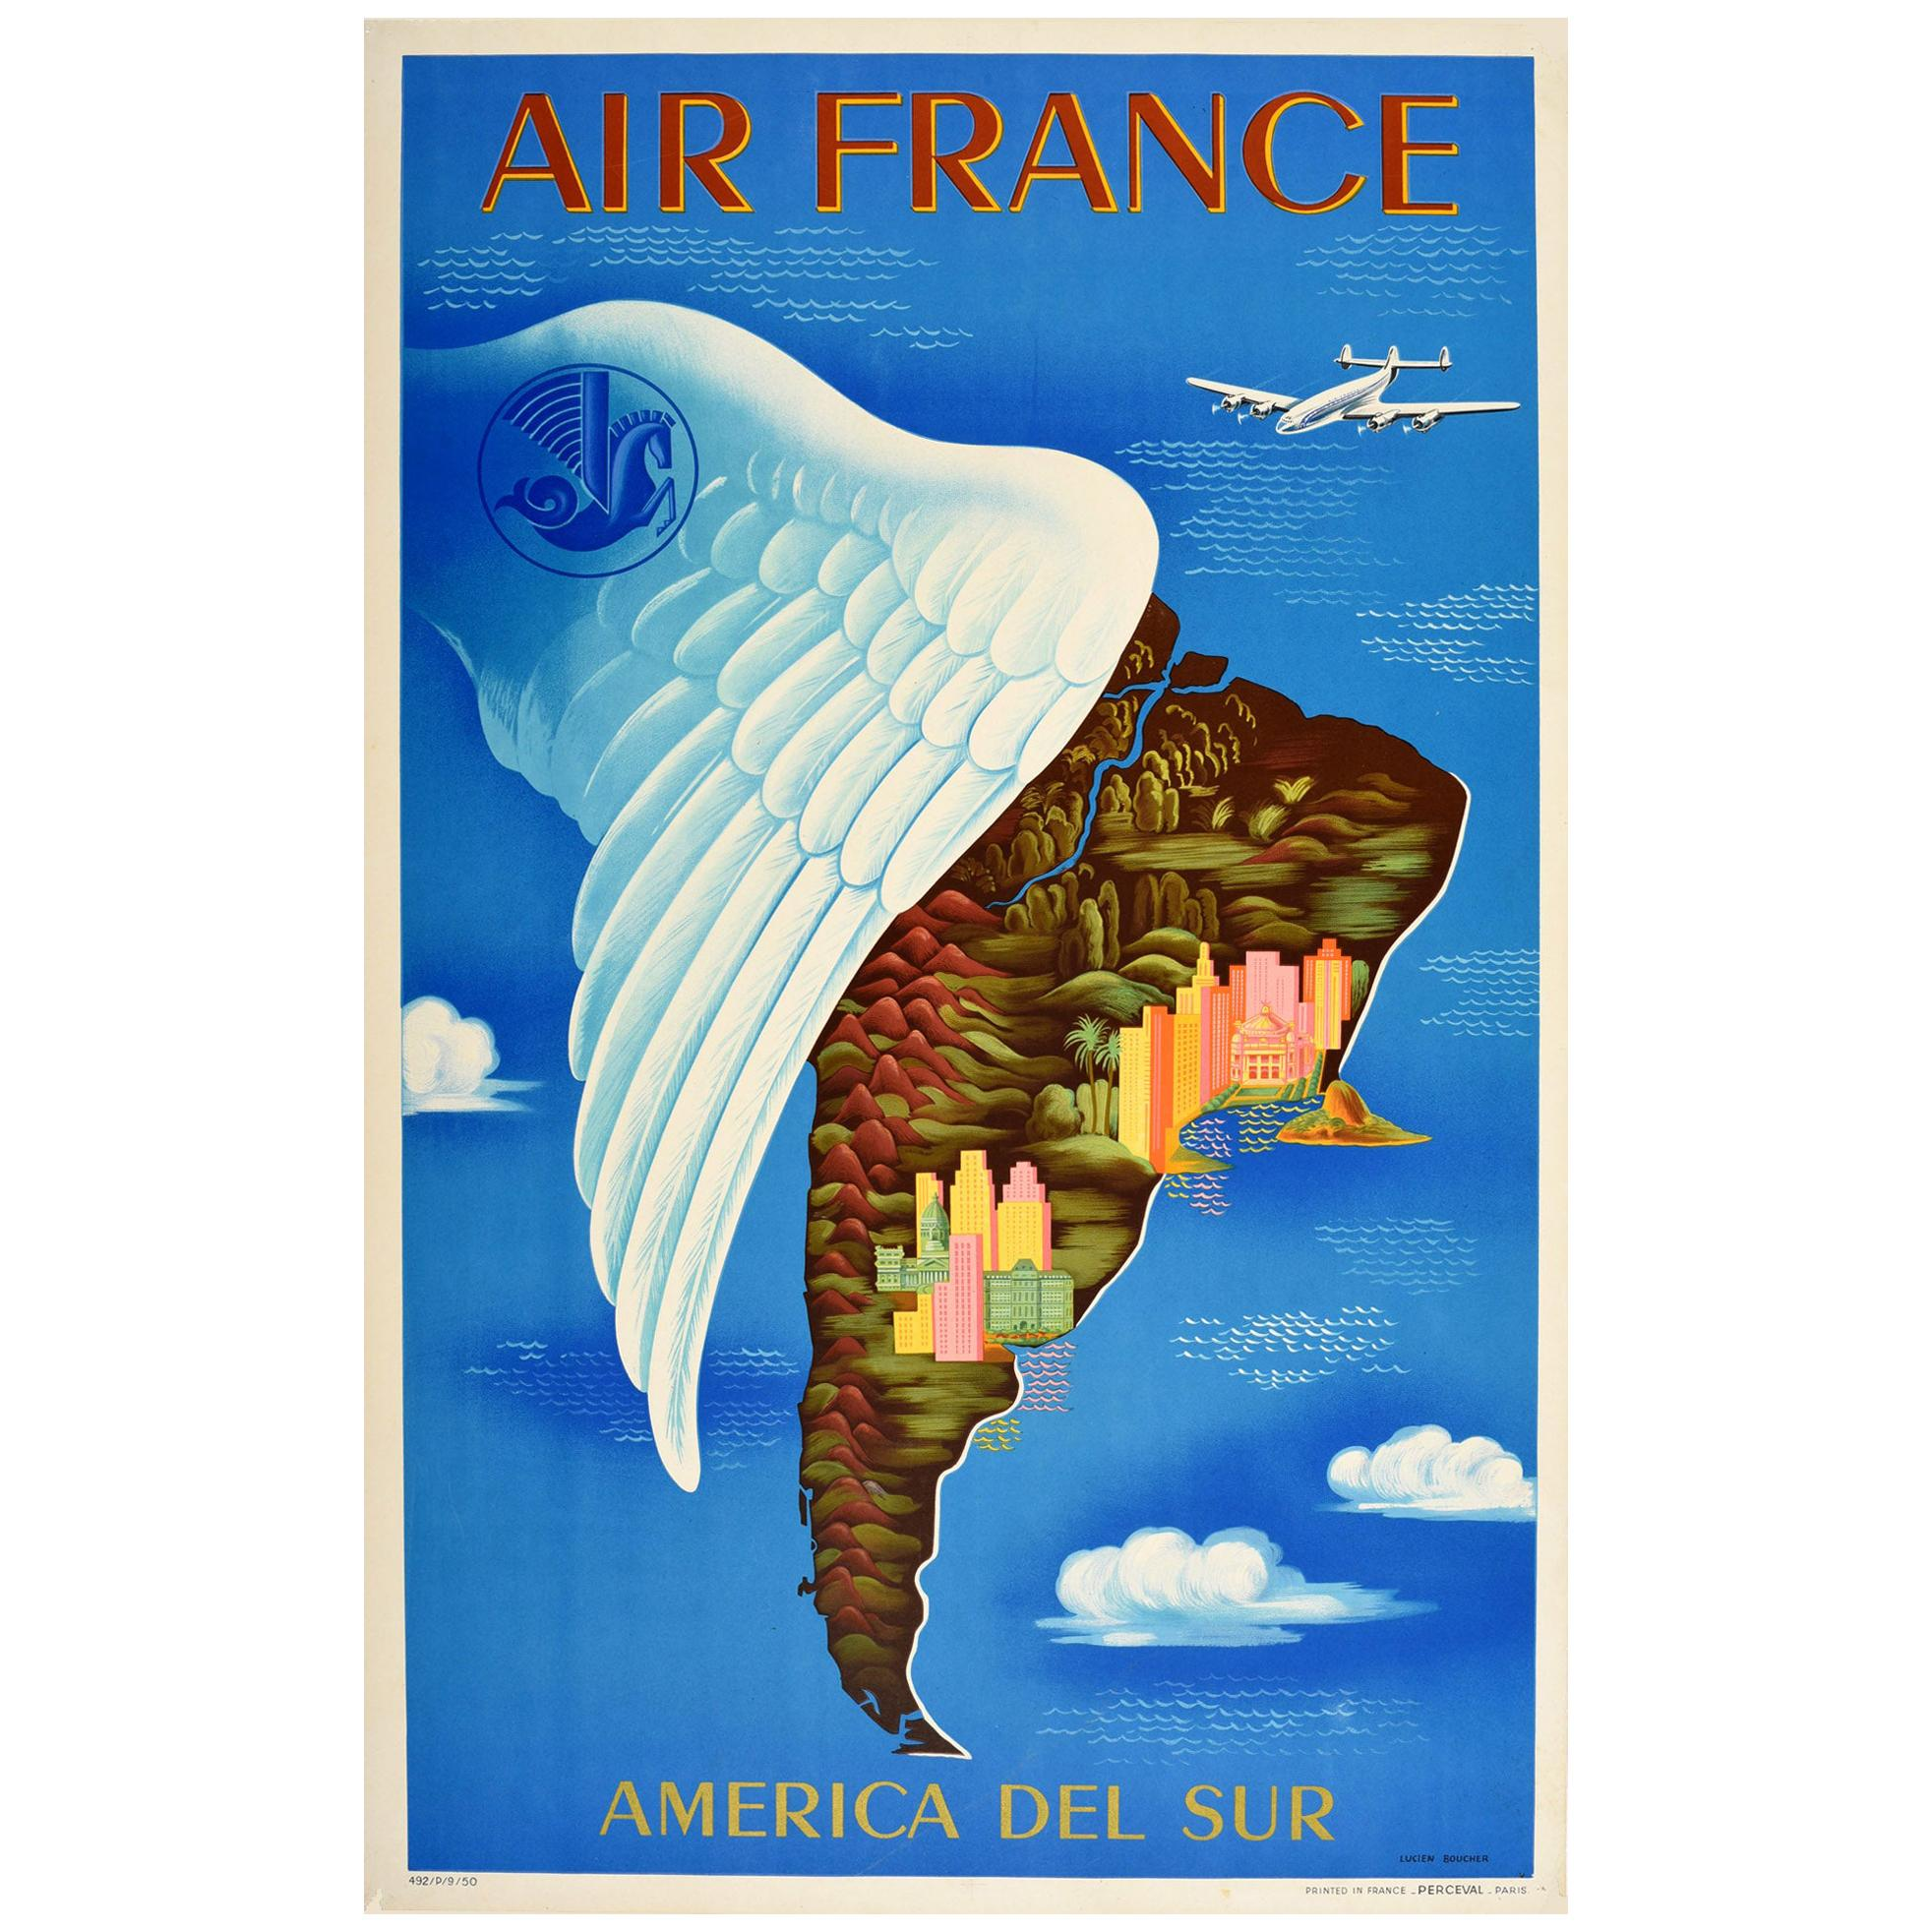 Original Vintage Travel Poster Air France South America Del Sur Map Wing Design